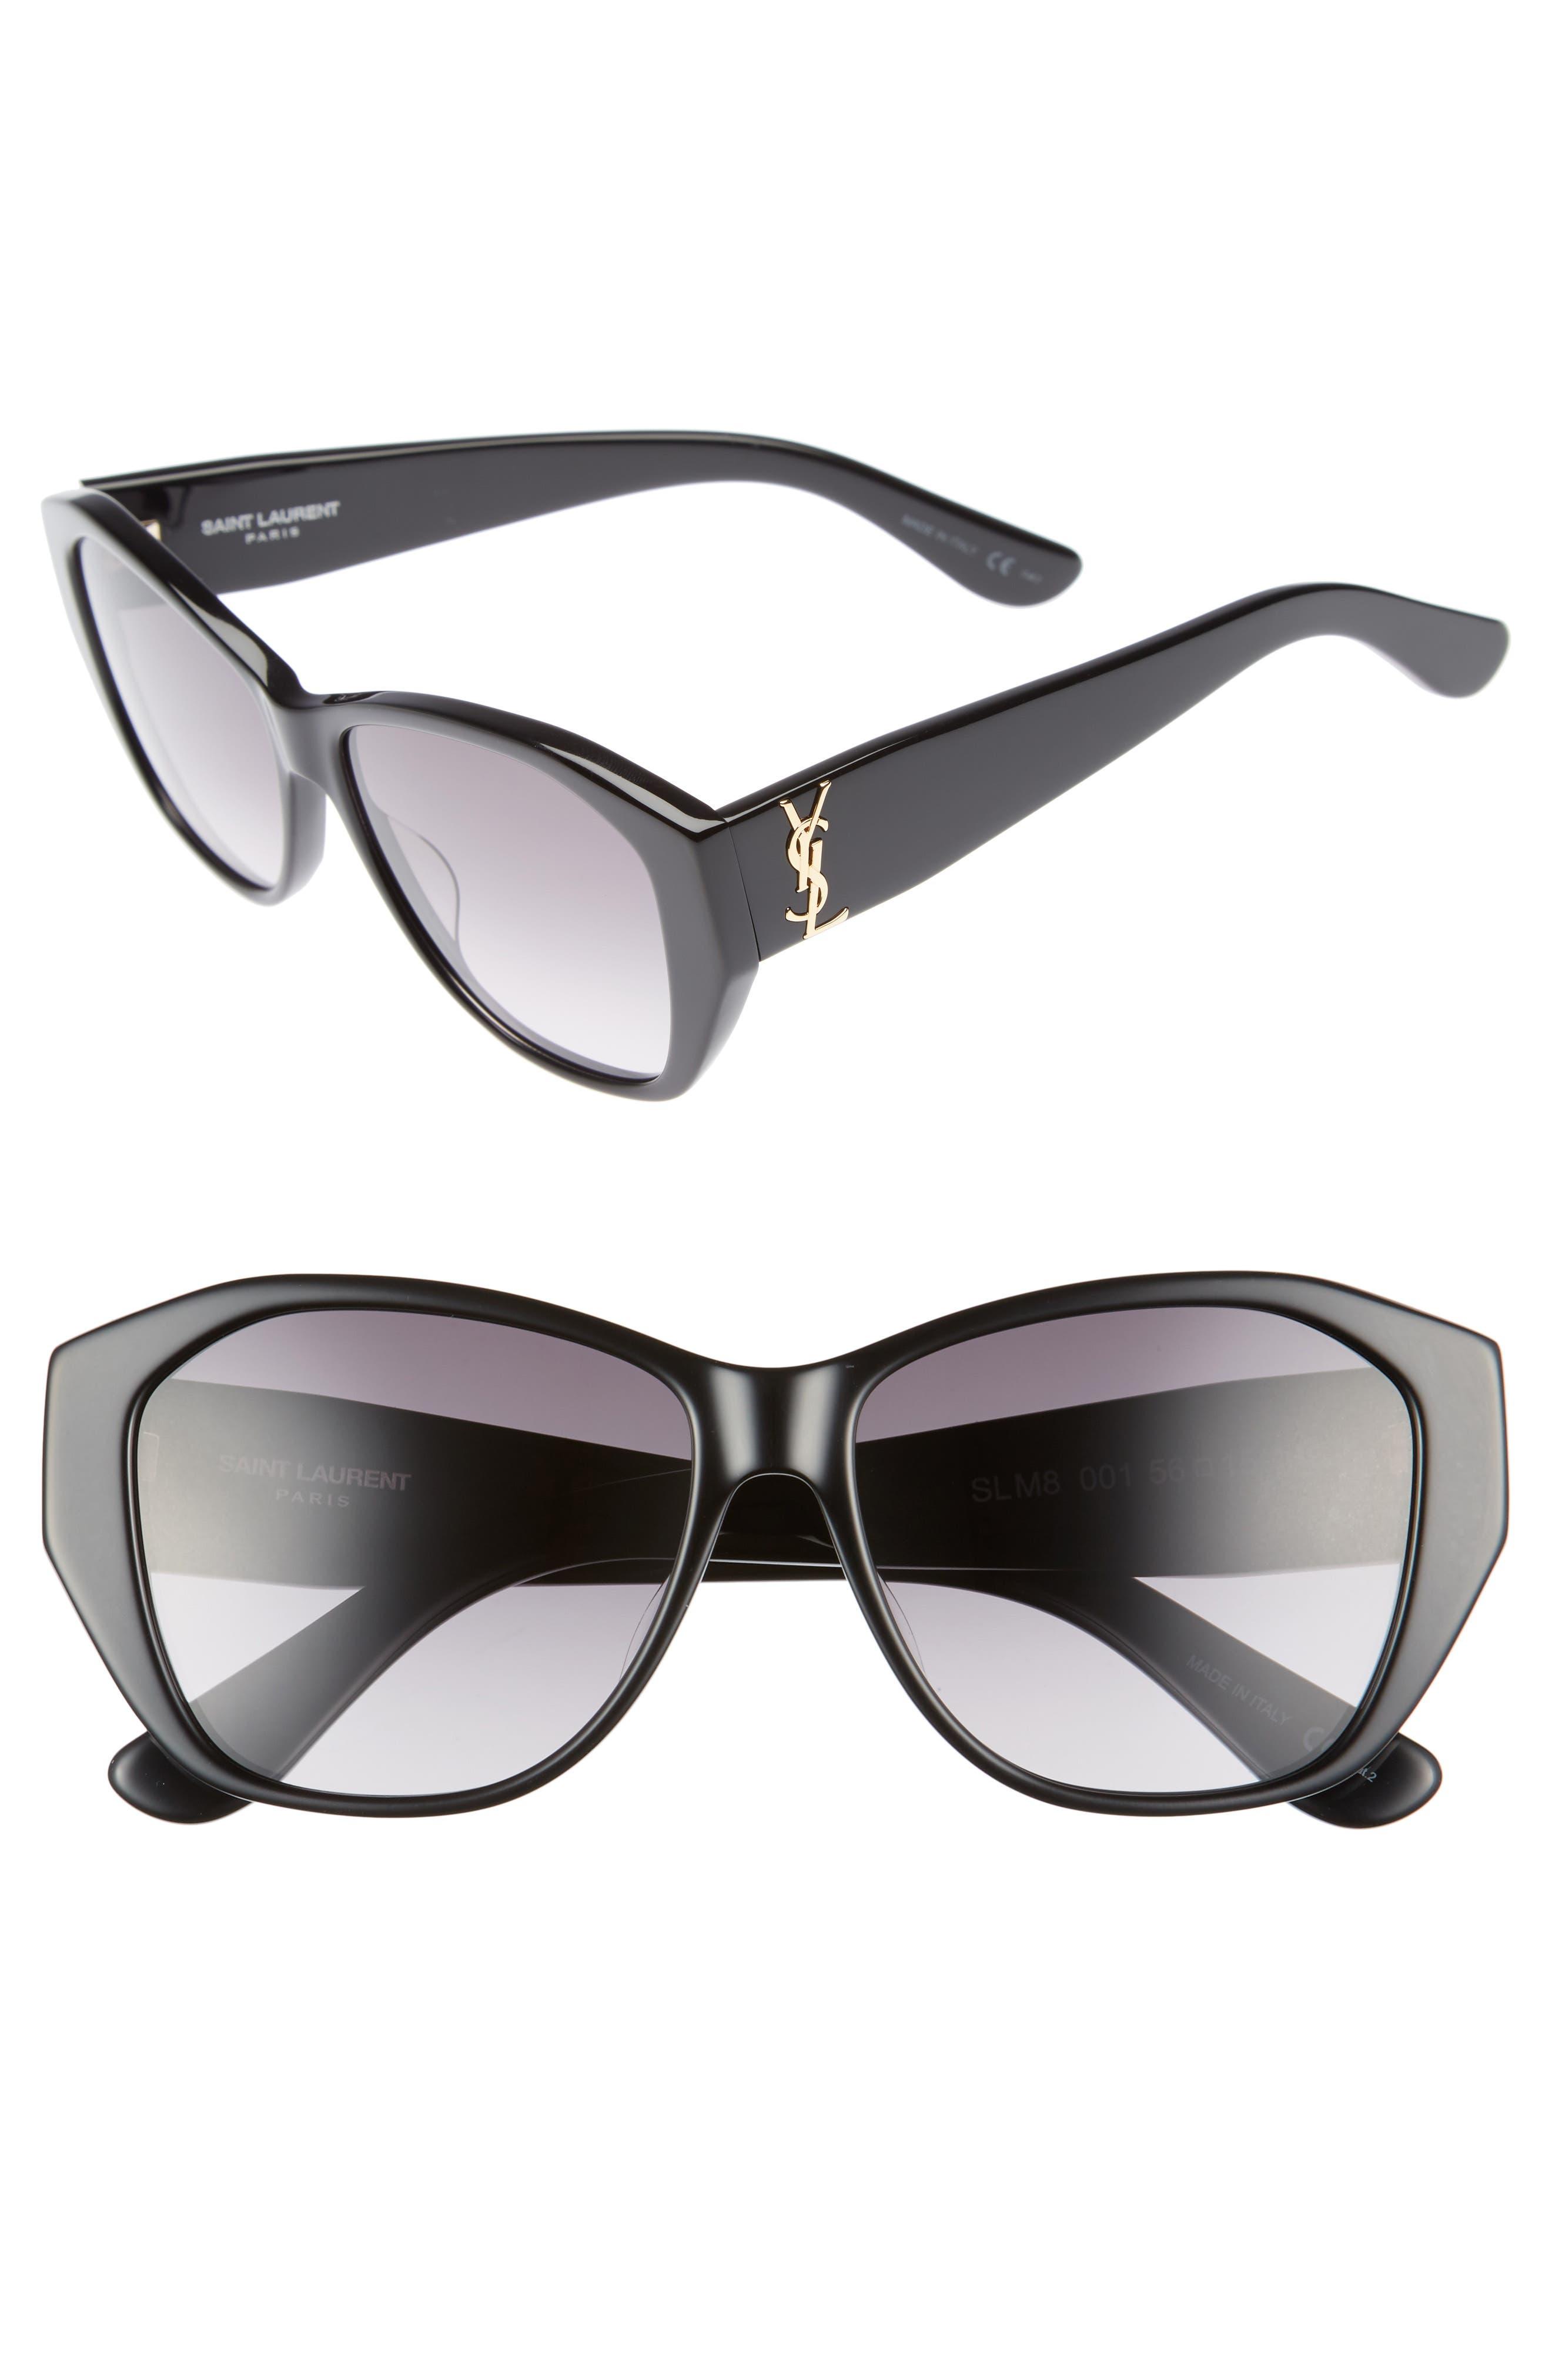 Main Image - Saint Laurent 56mm Sunglasses